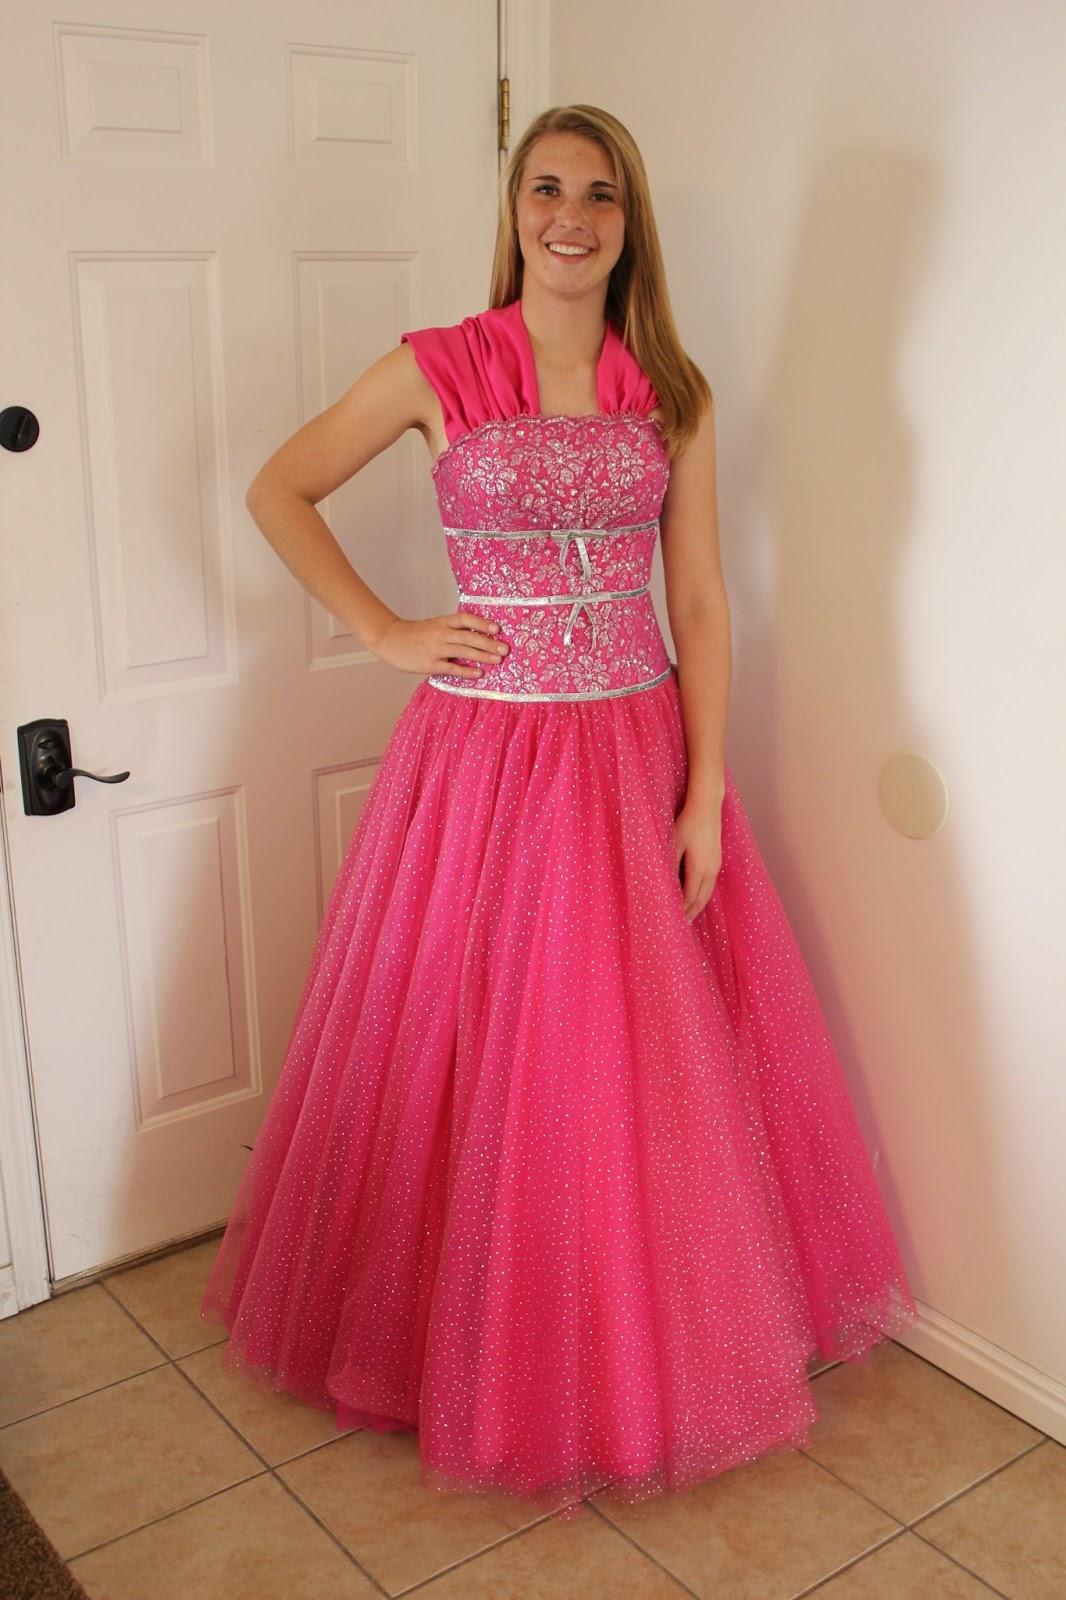 Can U Rent Prom Dresses - Eligent Prom Dresses